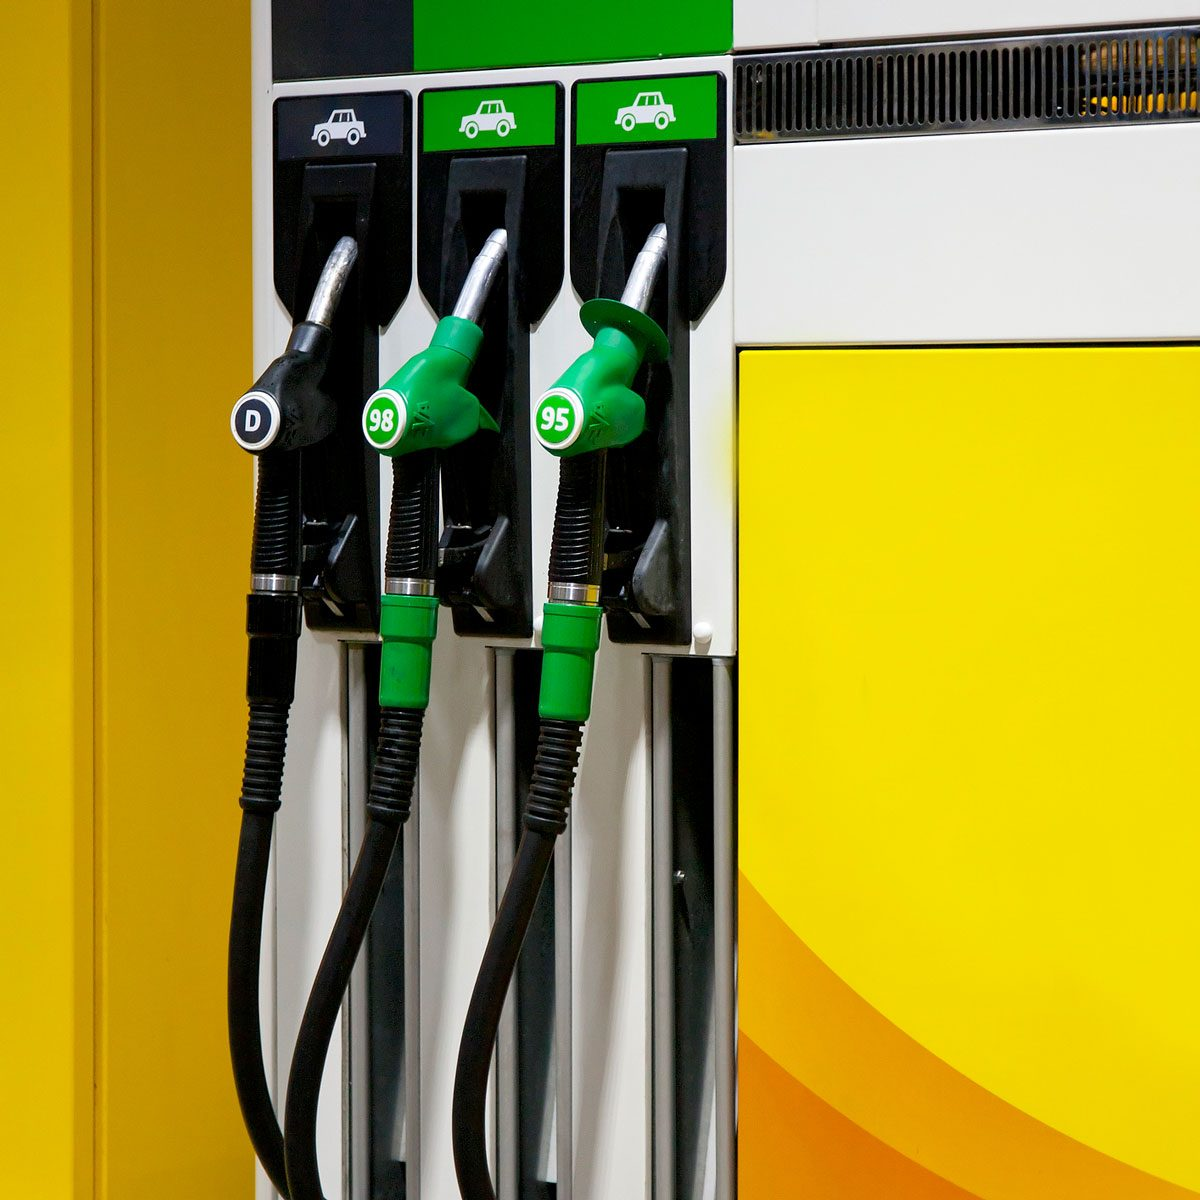 Gas pump with diesel